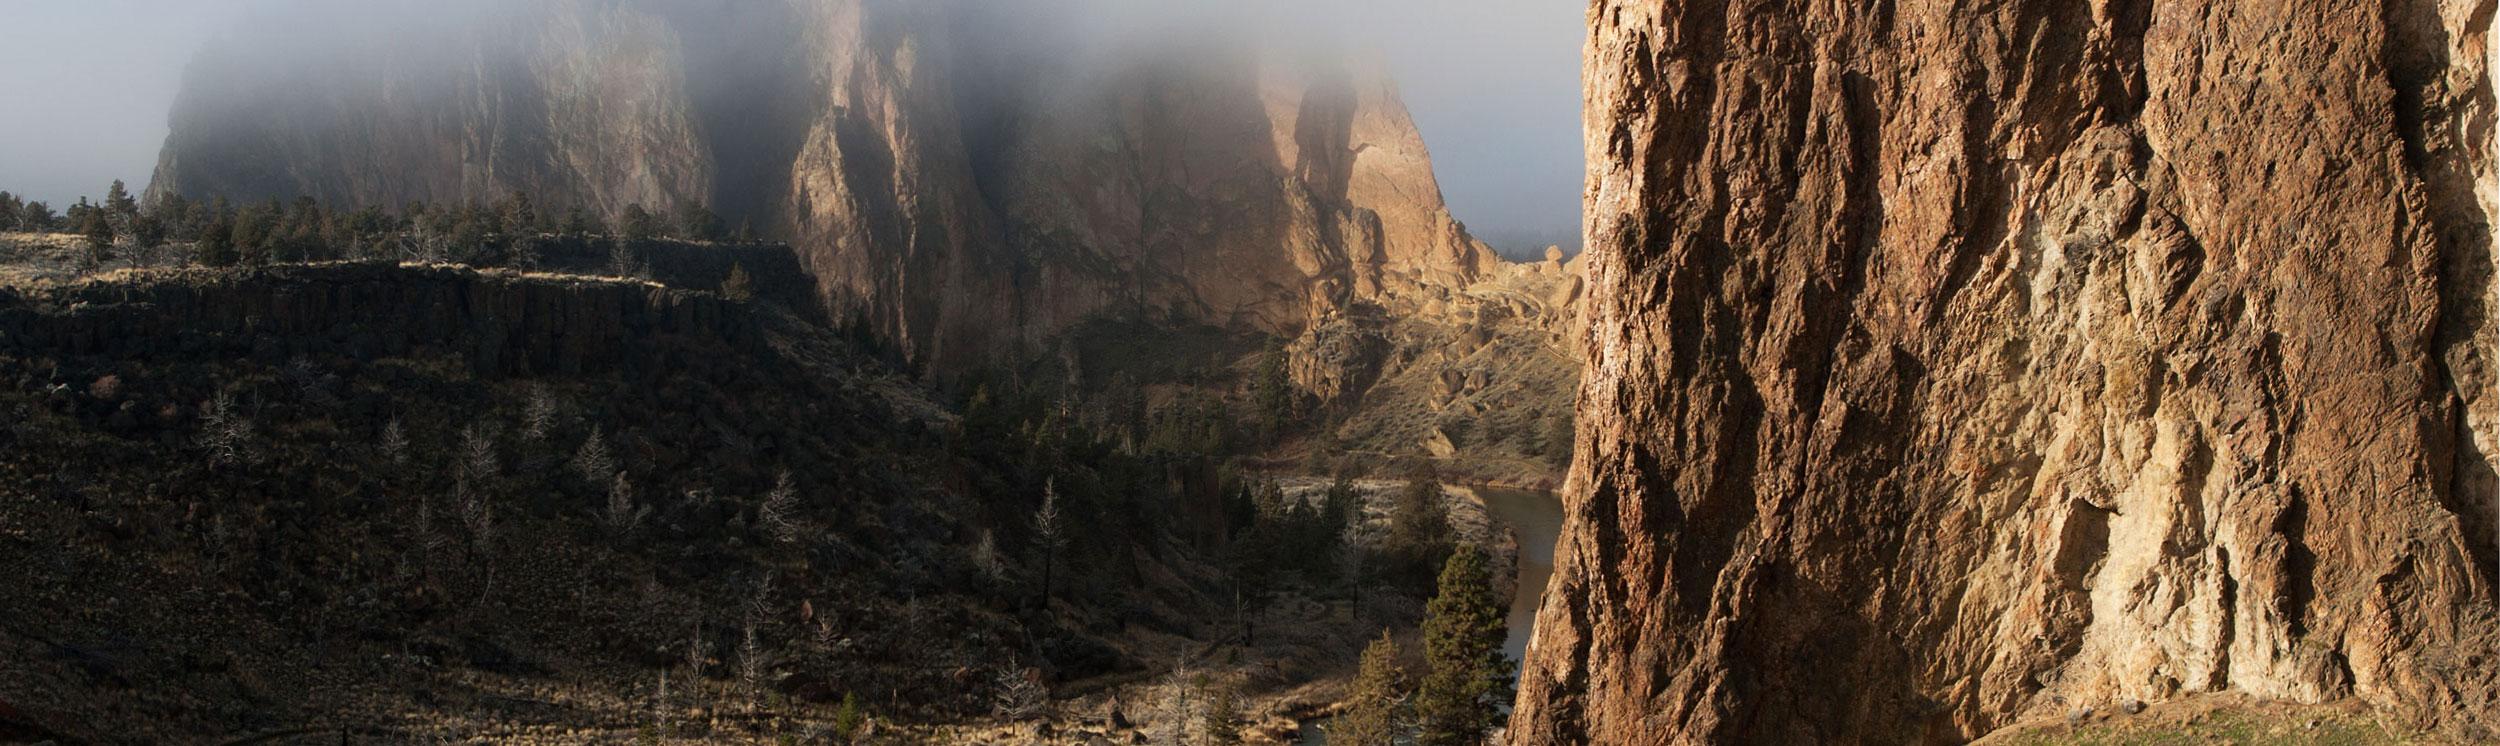 molten rock to - treasured park